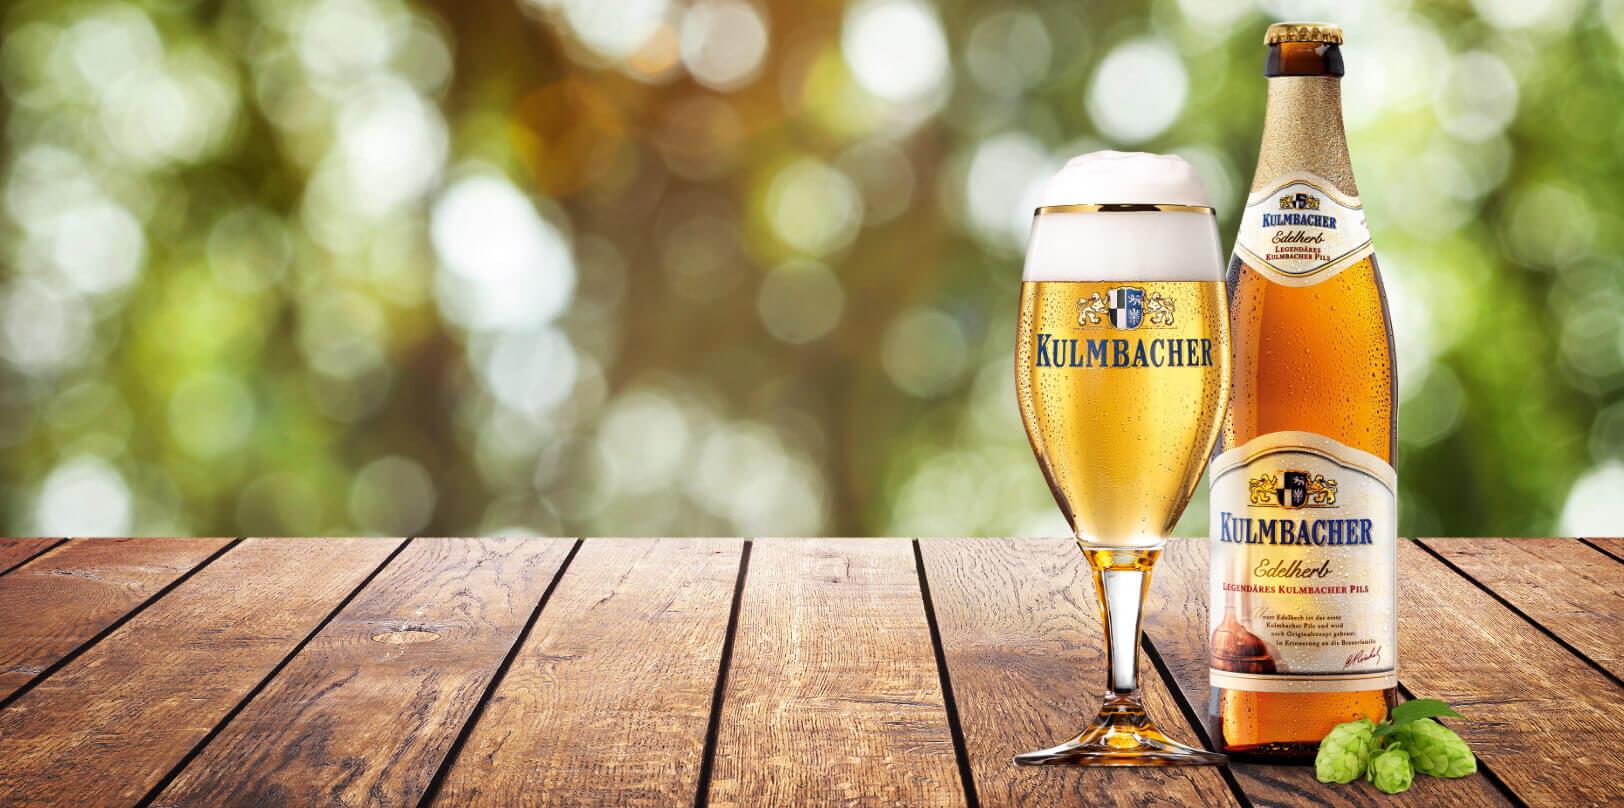 Einfach legendär - Kulmbacher Edelherb